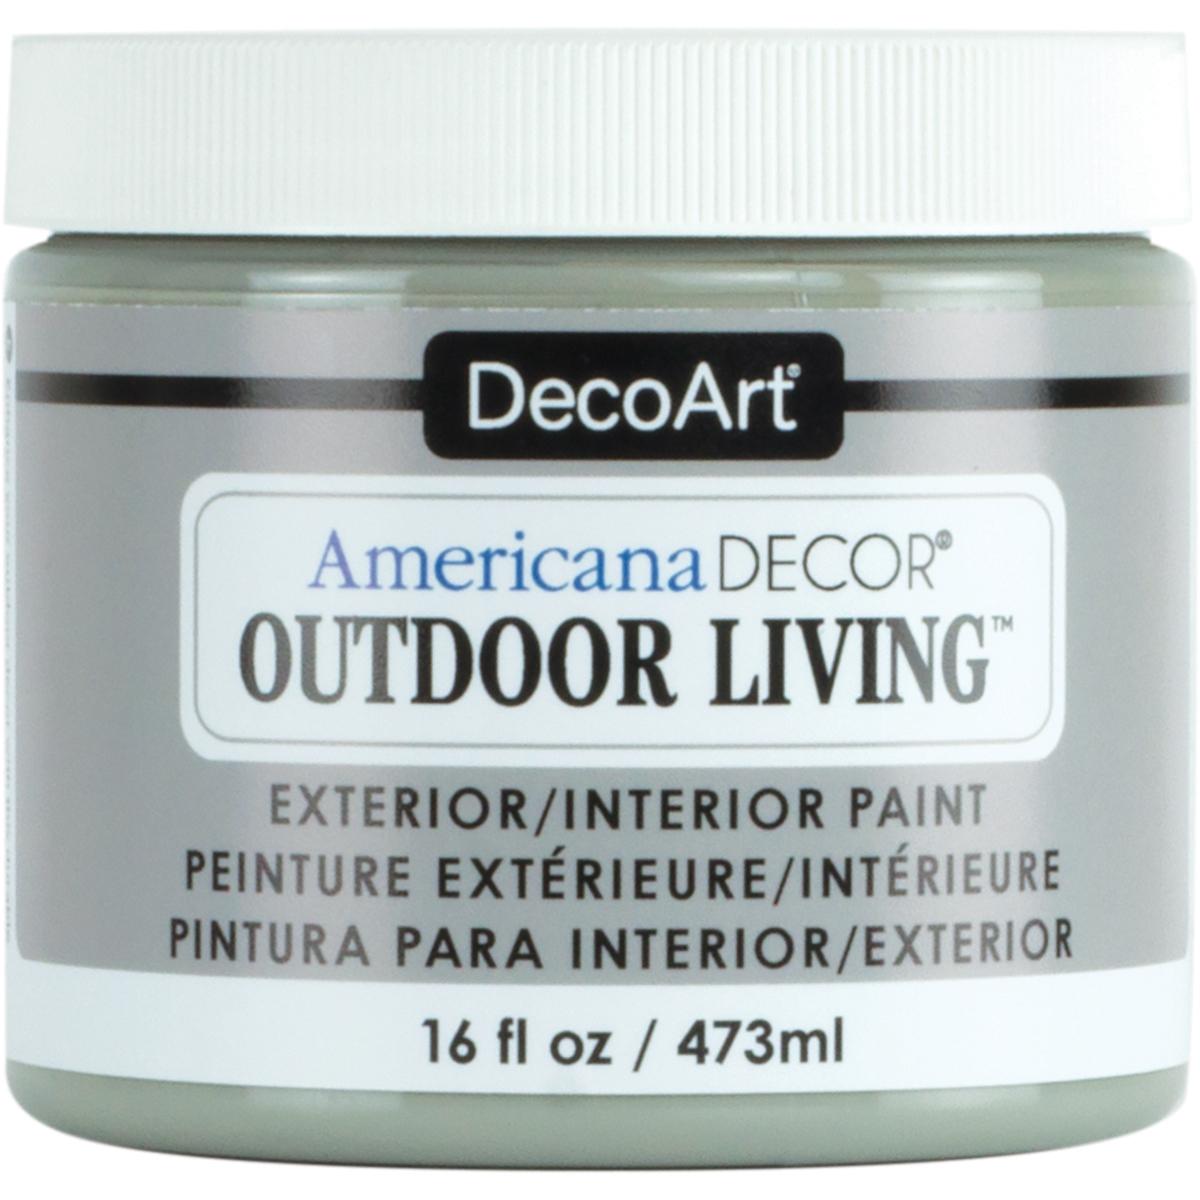 Patio - Americana Decor Outdoor Living Paint 16oz